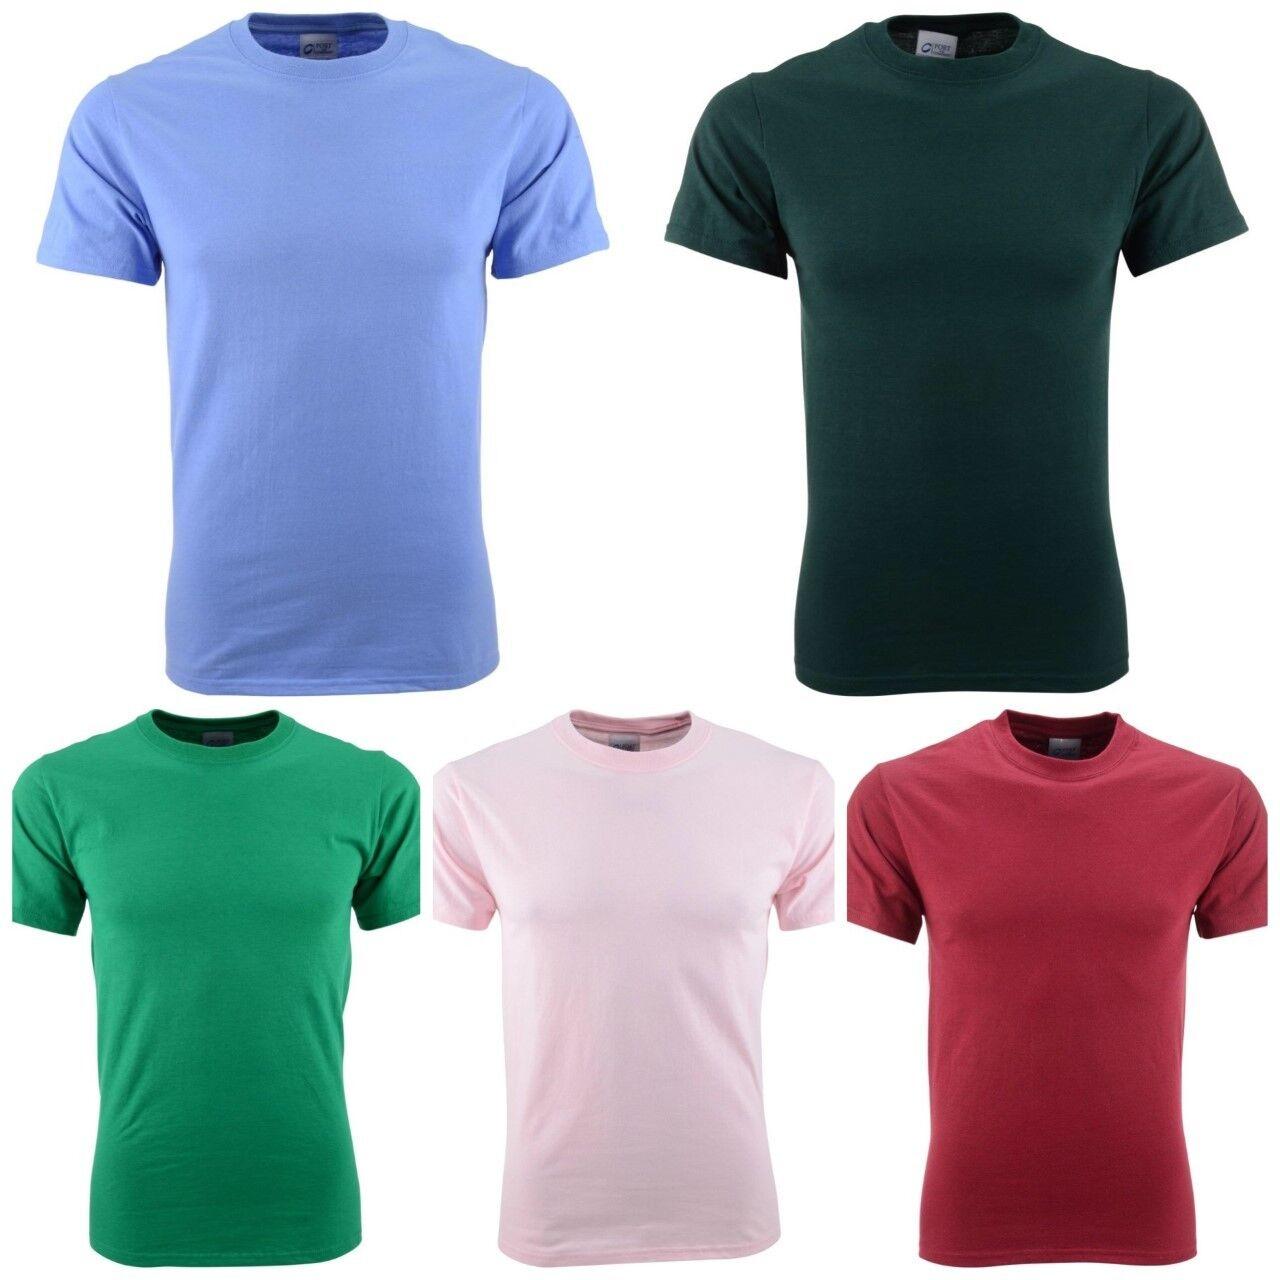 NEW  Port Authority T-Shirt Lot  Herren - Größe 3XL - Pre-Shrunk Cotton